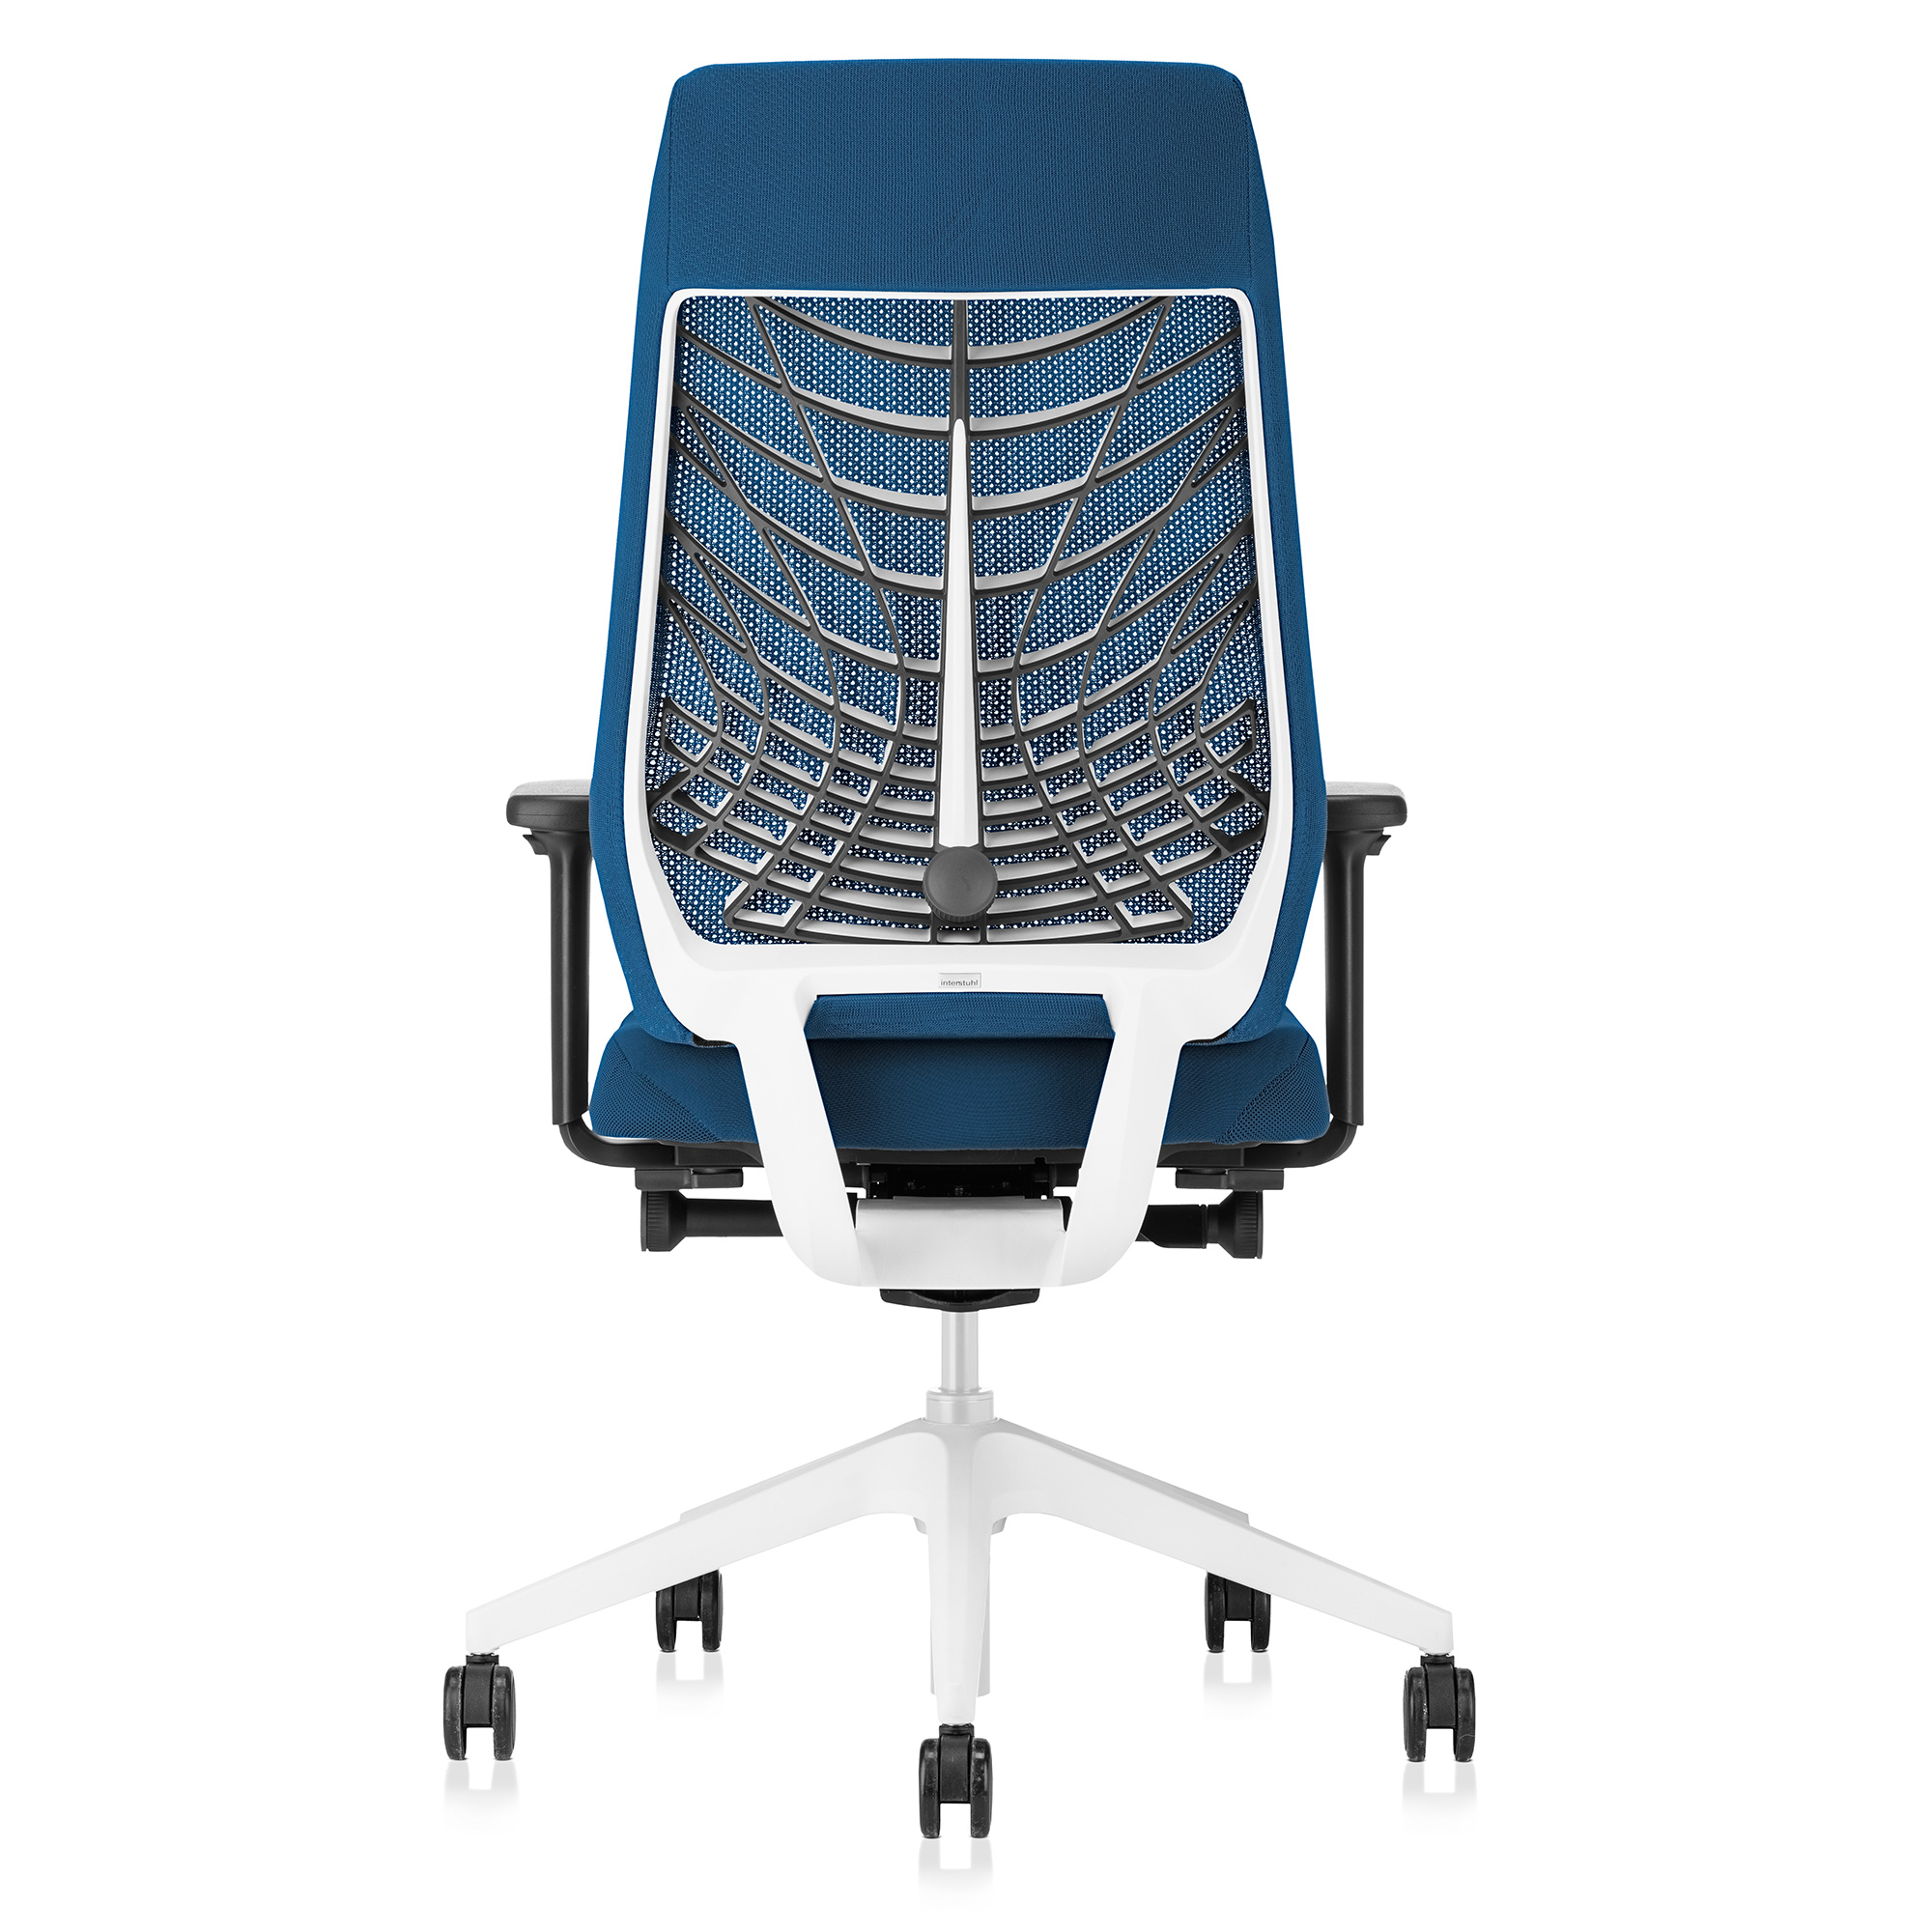 Interstuhl JOYCEis3 JC217 Bürostuhl mit hoher FlexGrid-Rückenlehne